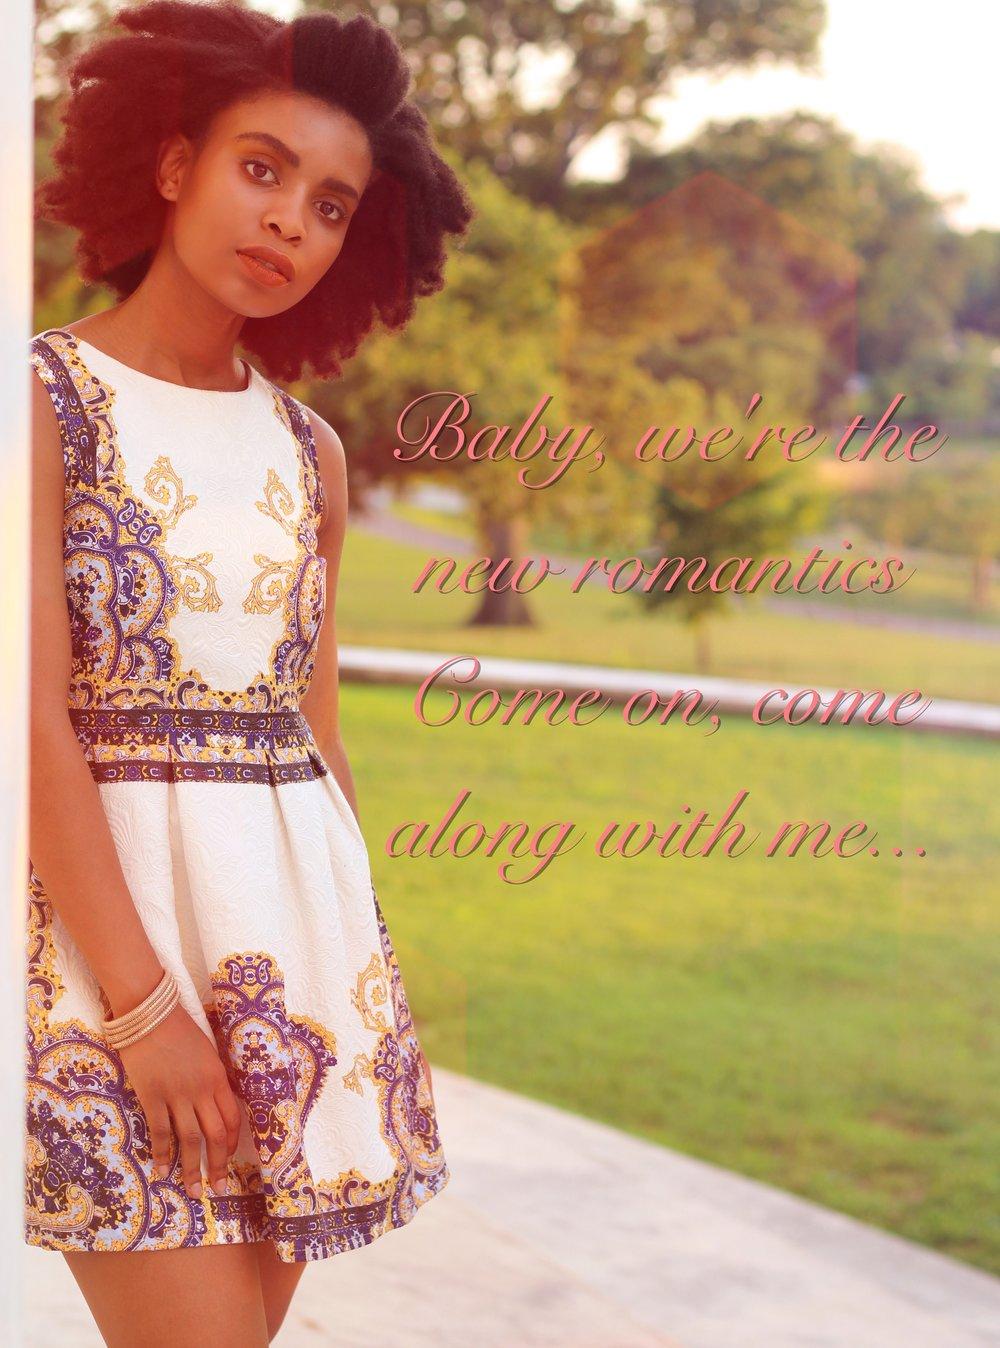 New Romantics 5.jpg